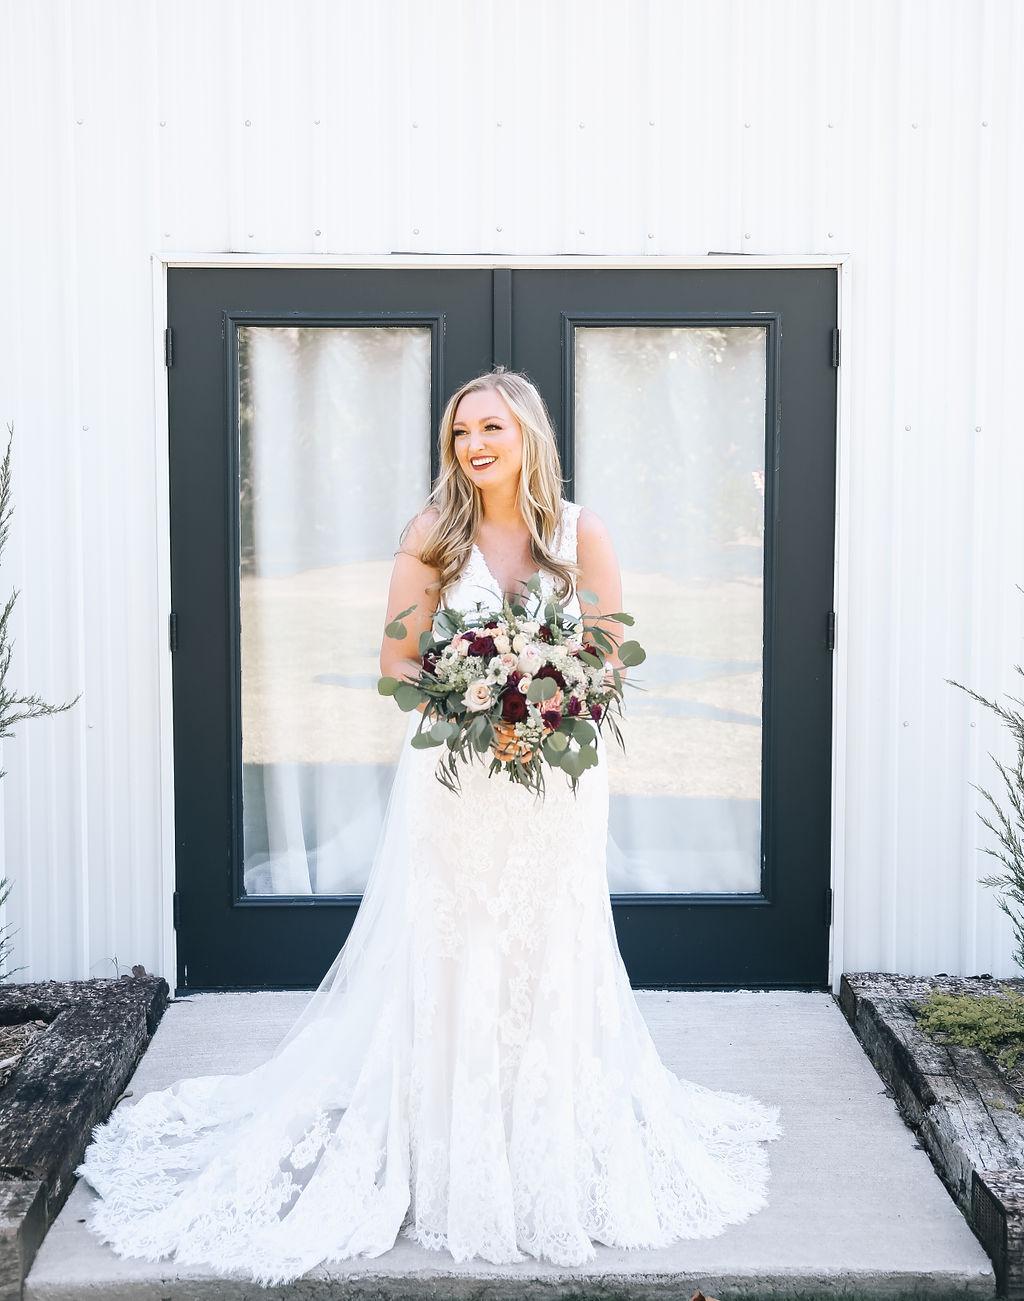 Tulsa Wedding White Barn 15.JPG